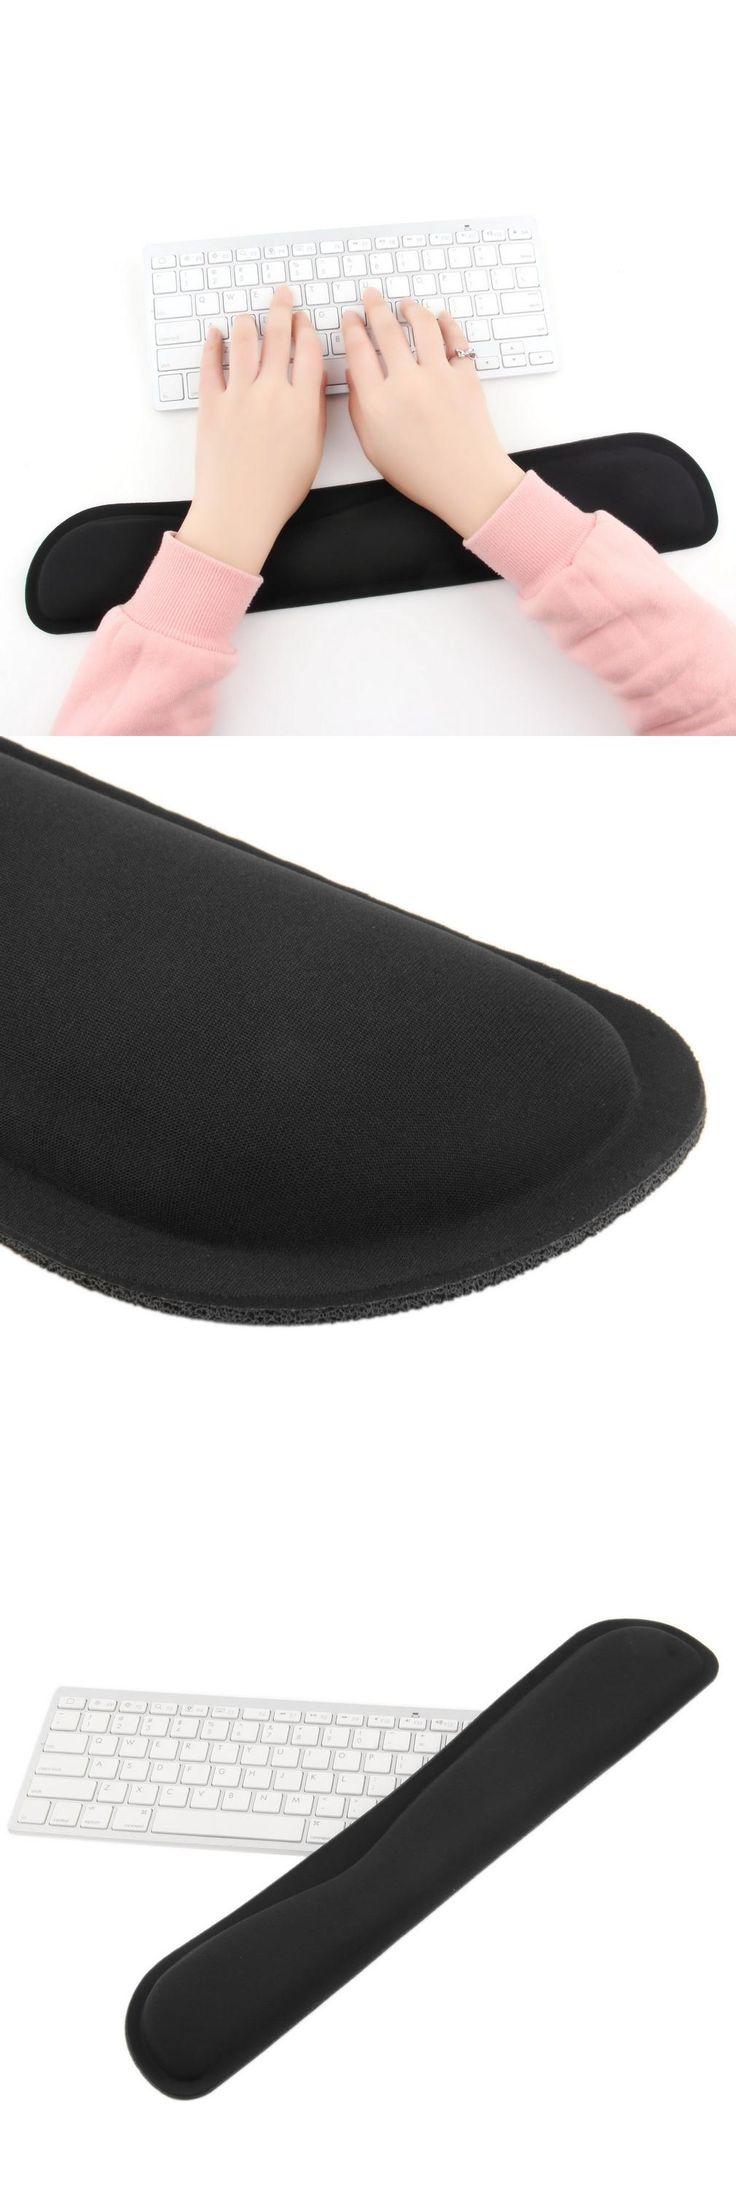 [Visit to Buy] 1pcs Black Support Comfort Gel Wrist Rest Pad for PC Keyboard Raised Platform Hands #Advertisement